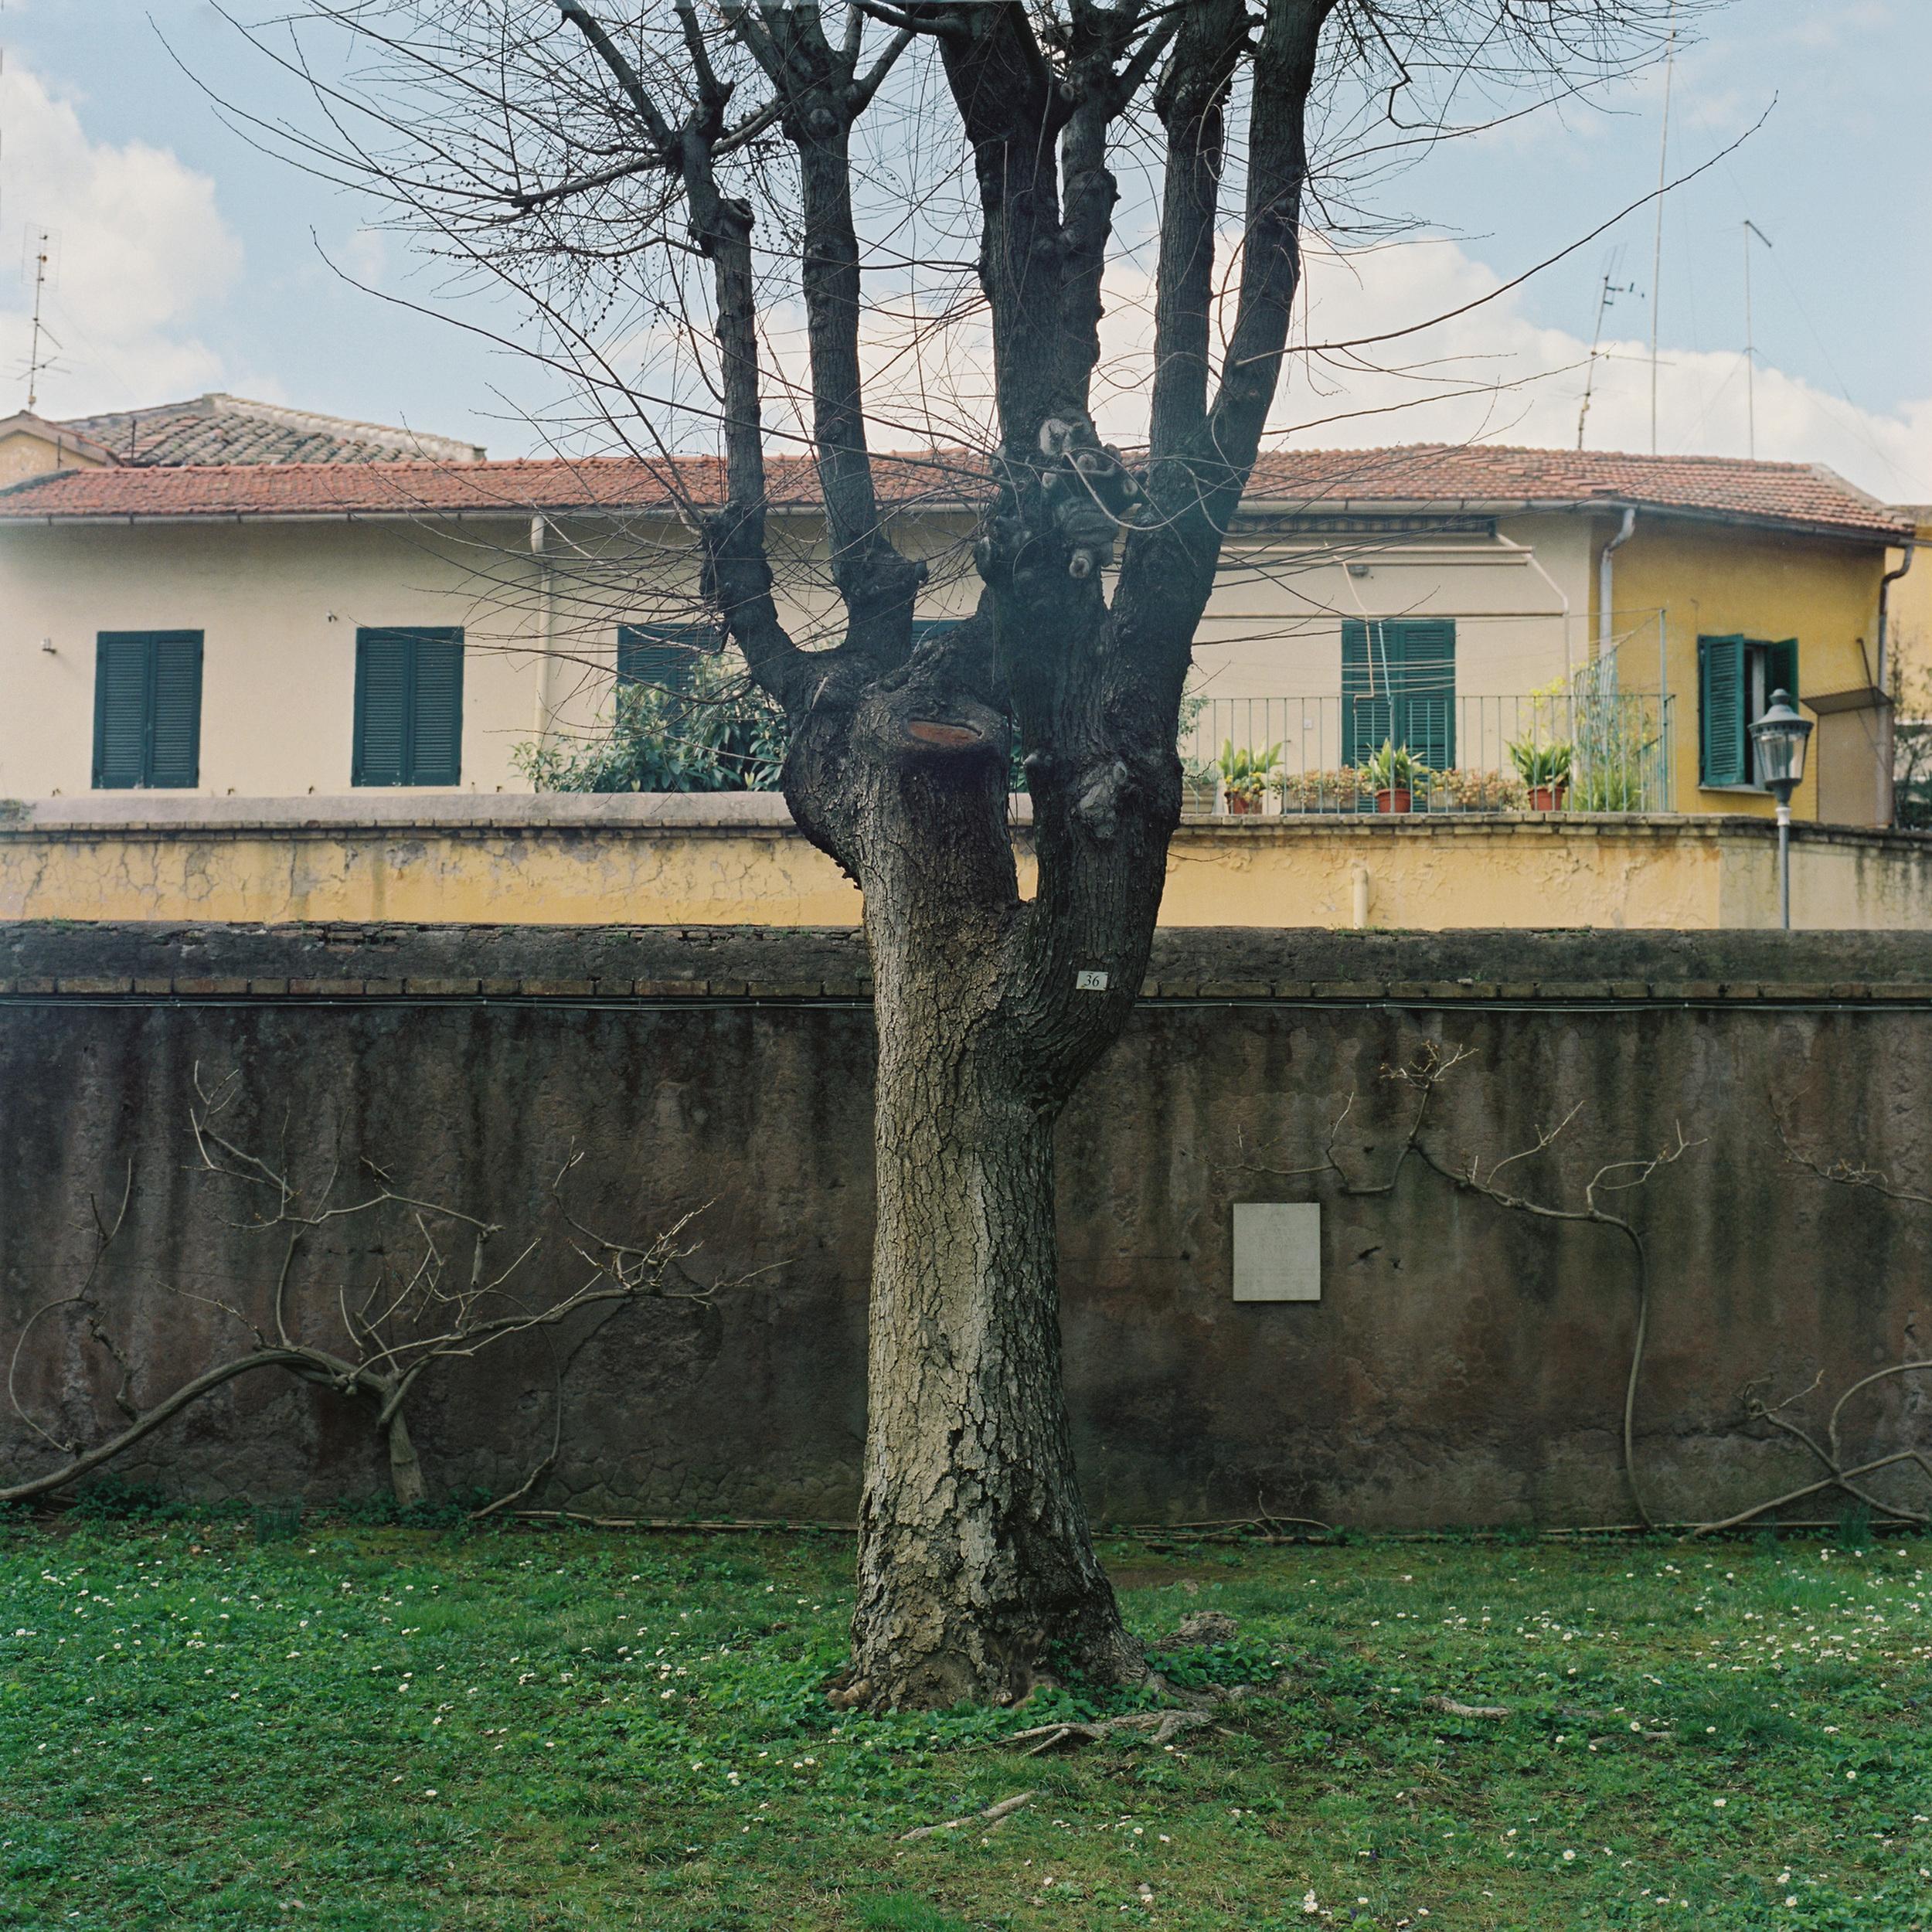 Cimitero Acattolico, Rome, 215